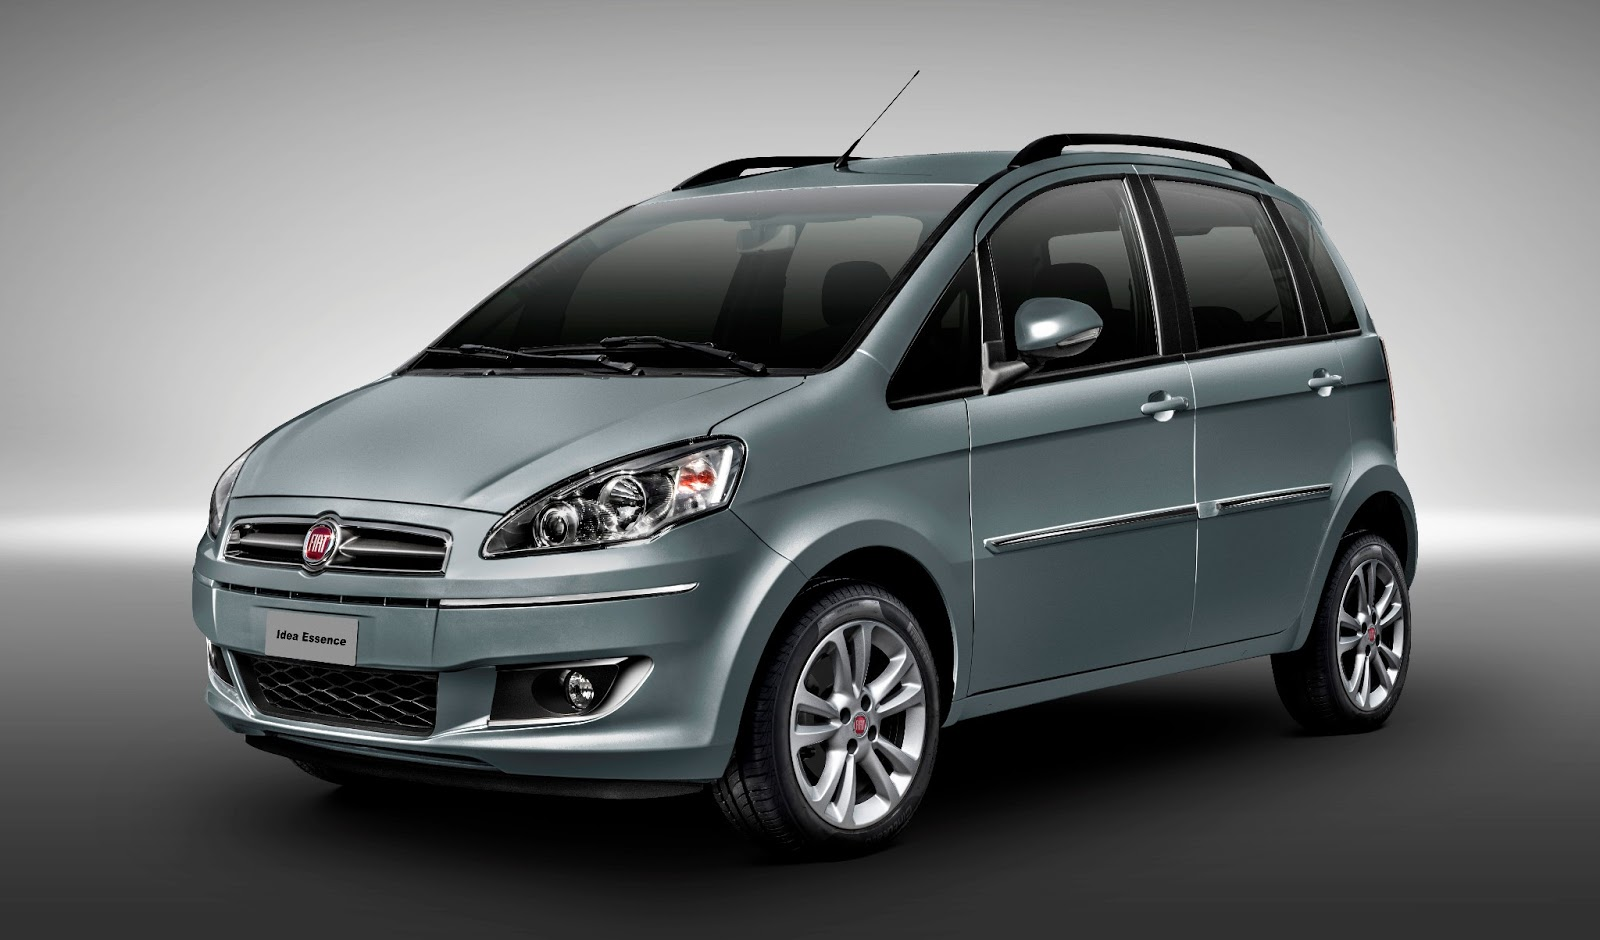 Fiat idea recebe novidades na linha 2014 for Precio del fiat idea adventure 2014